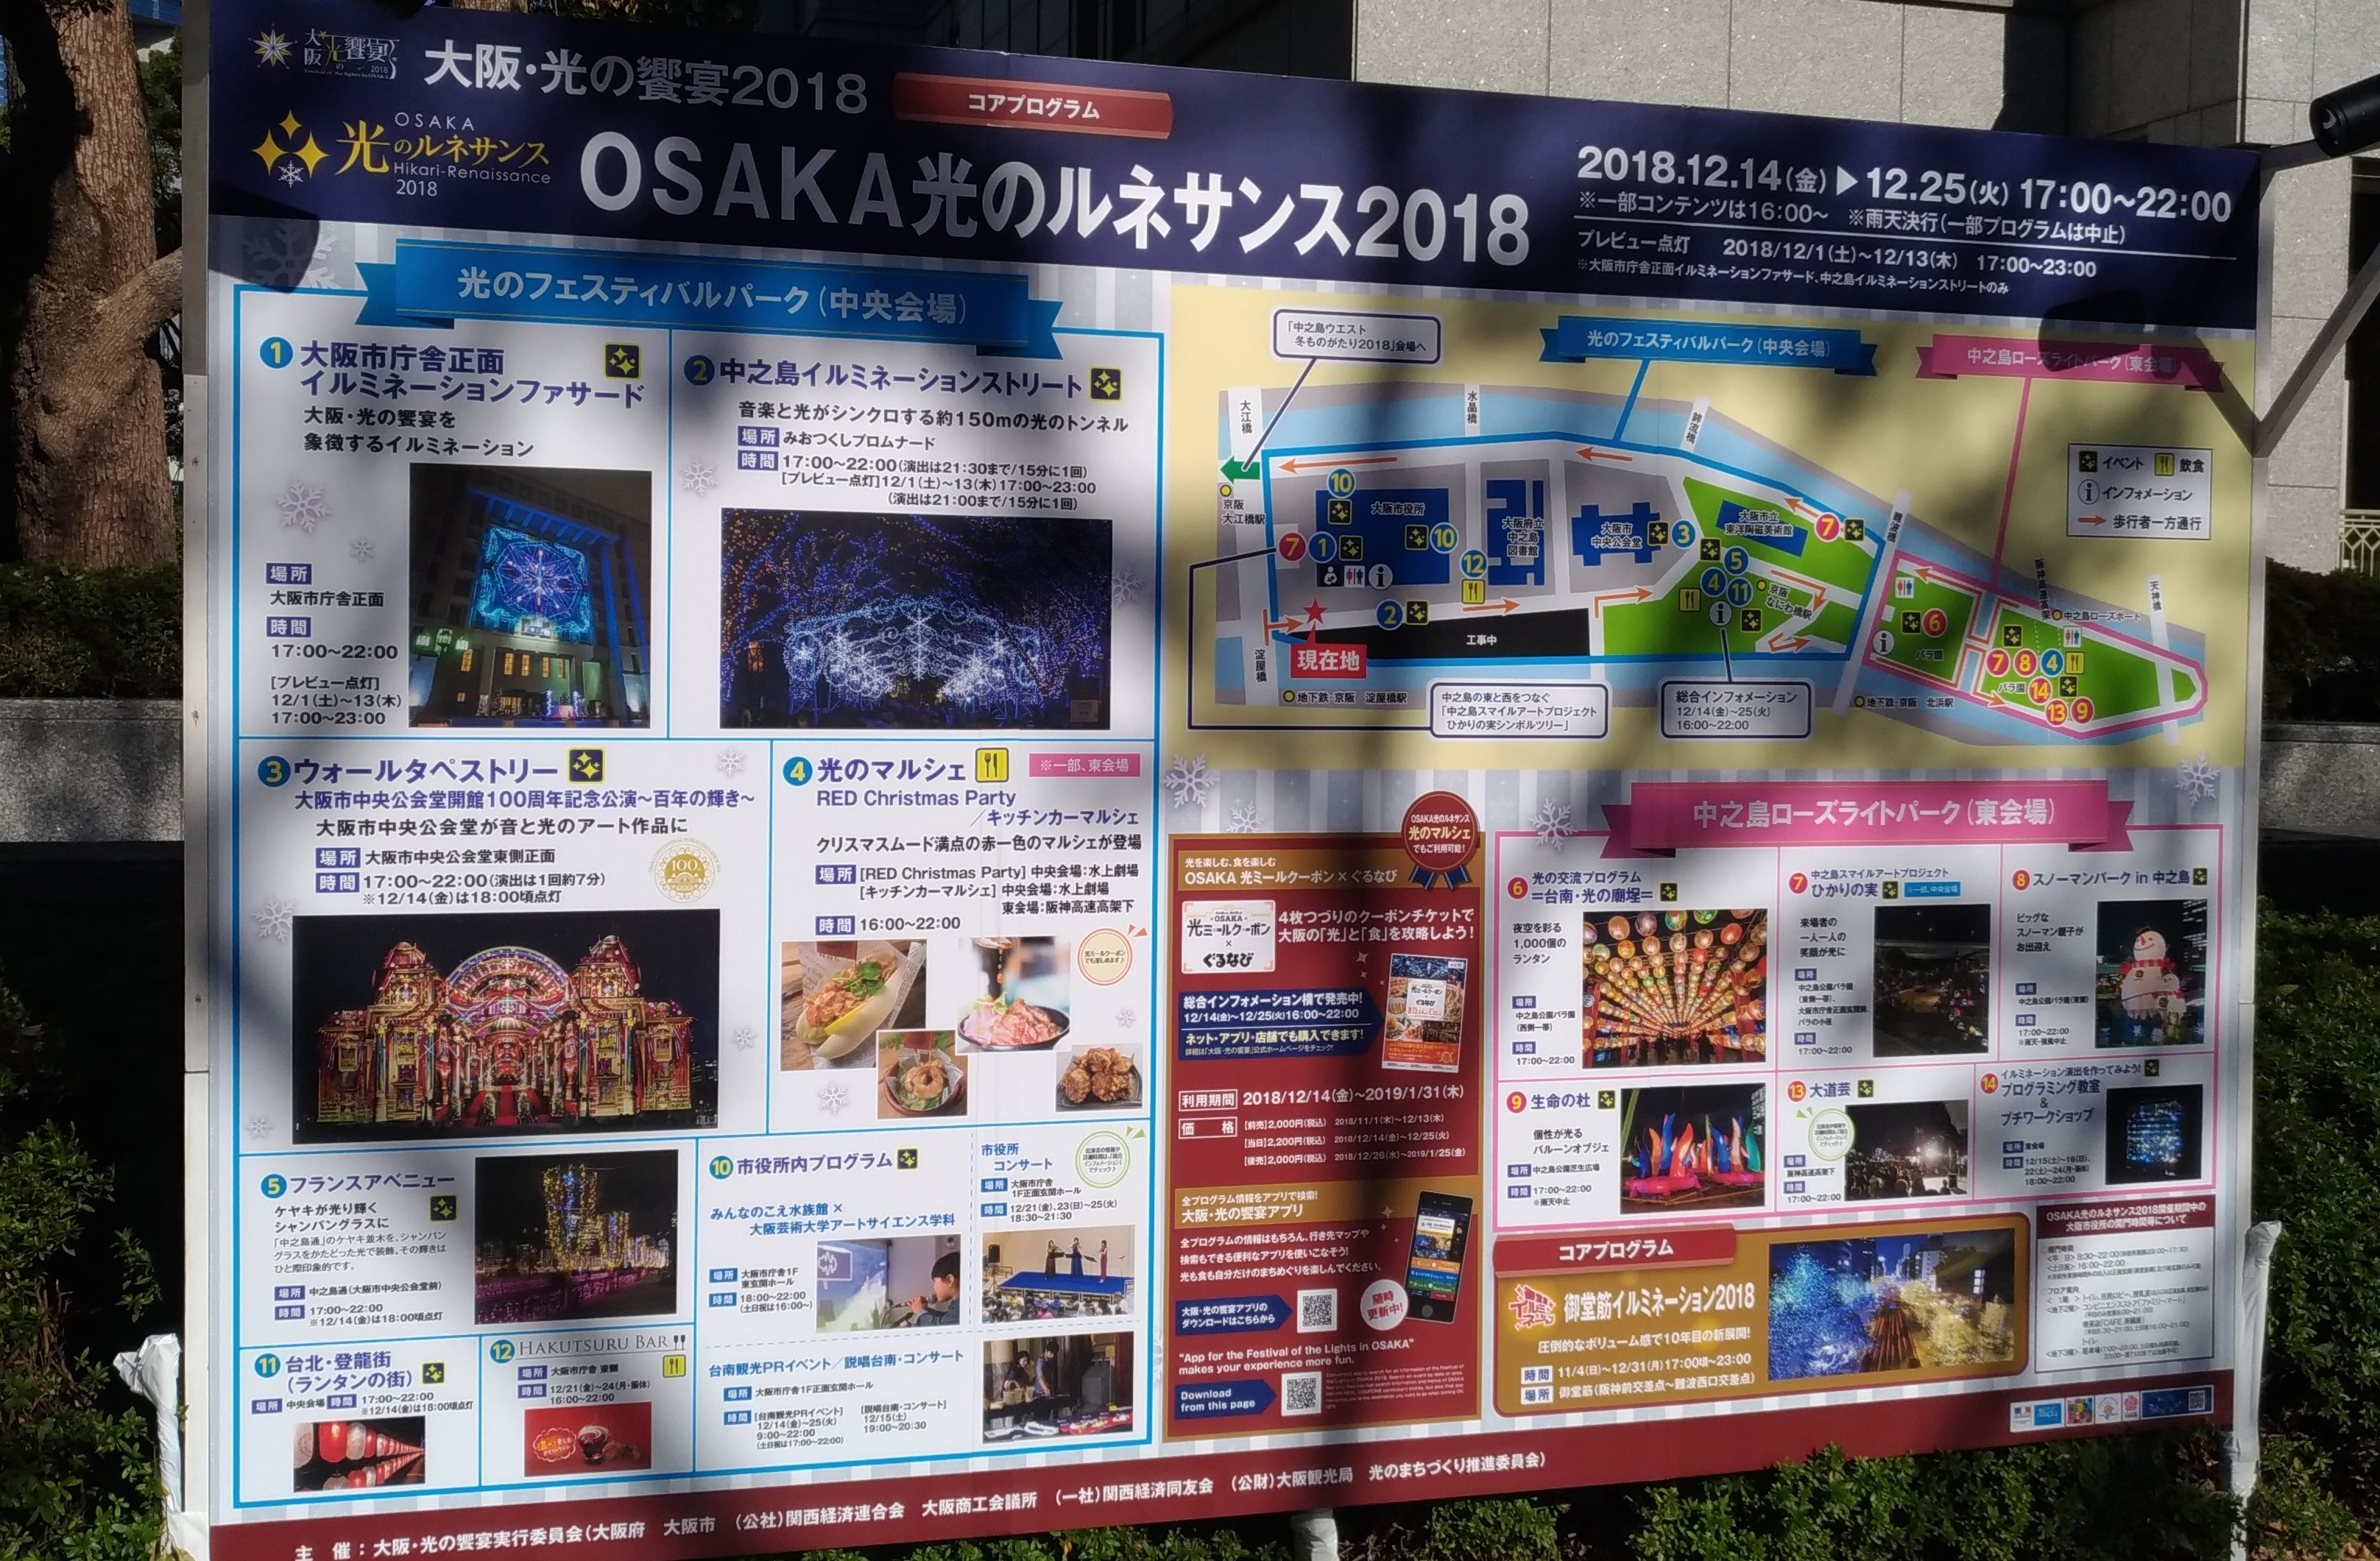 osaka_kanko_2018.jpg